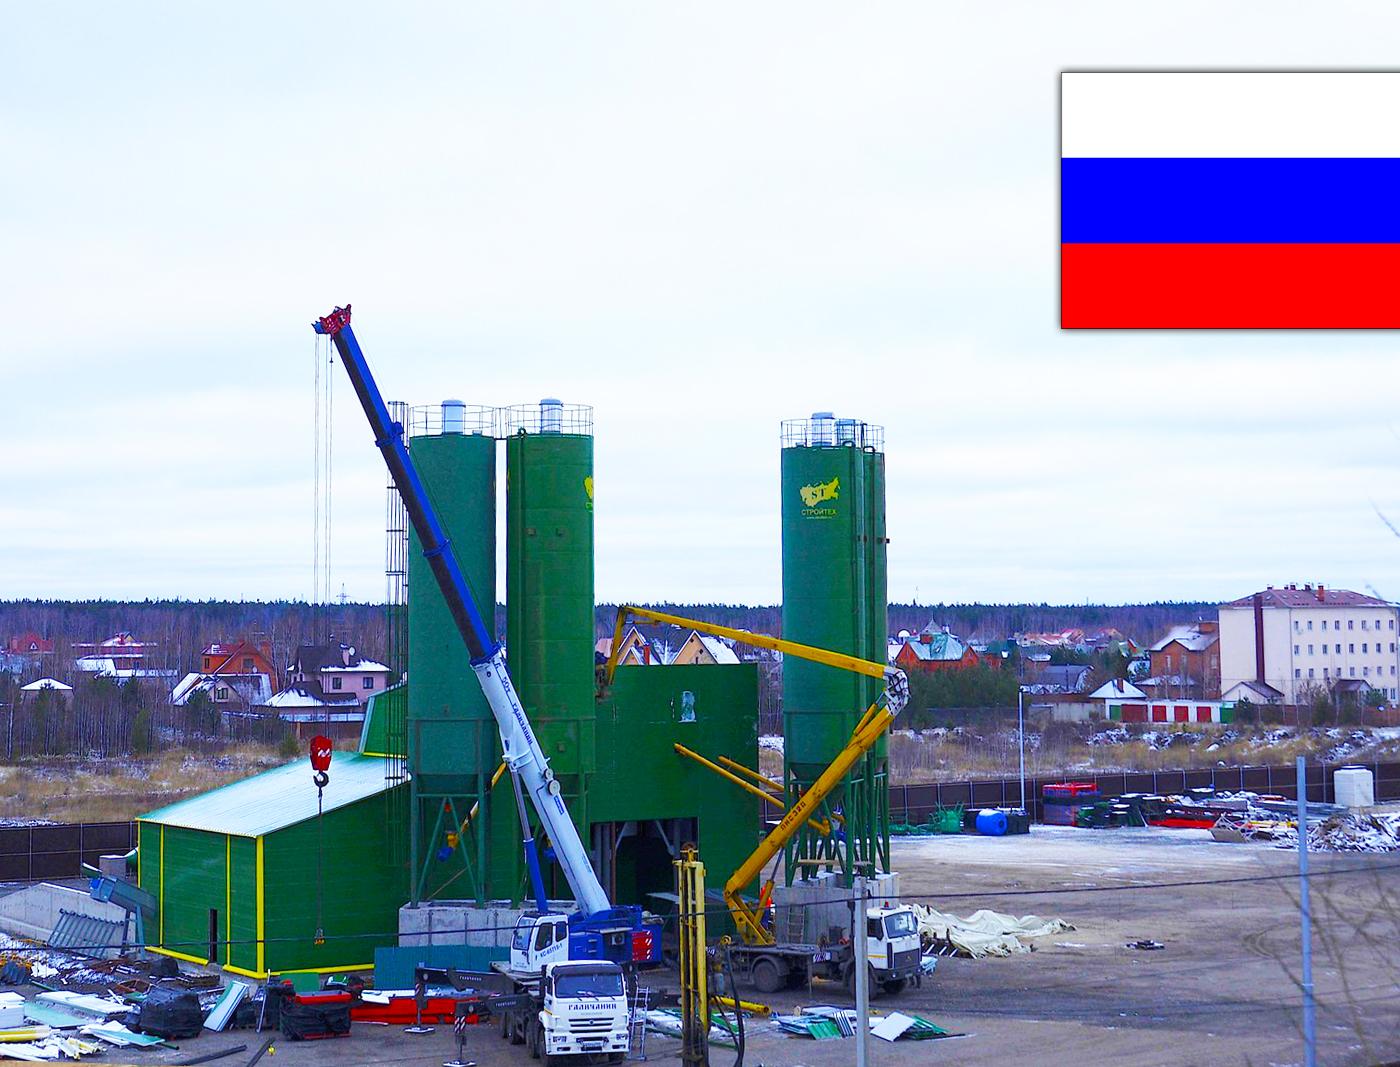 st-machine russian concrete plants.jpg